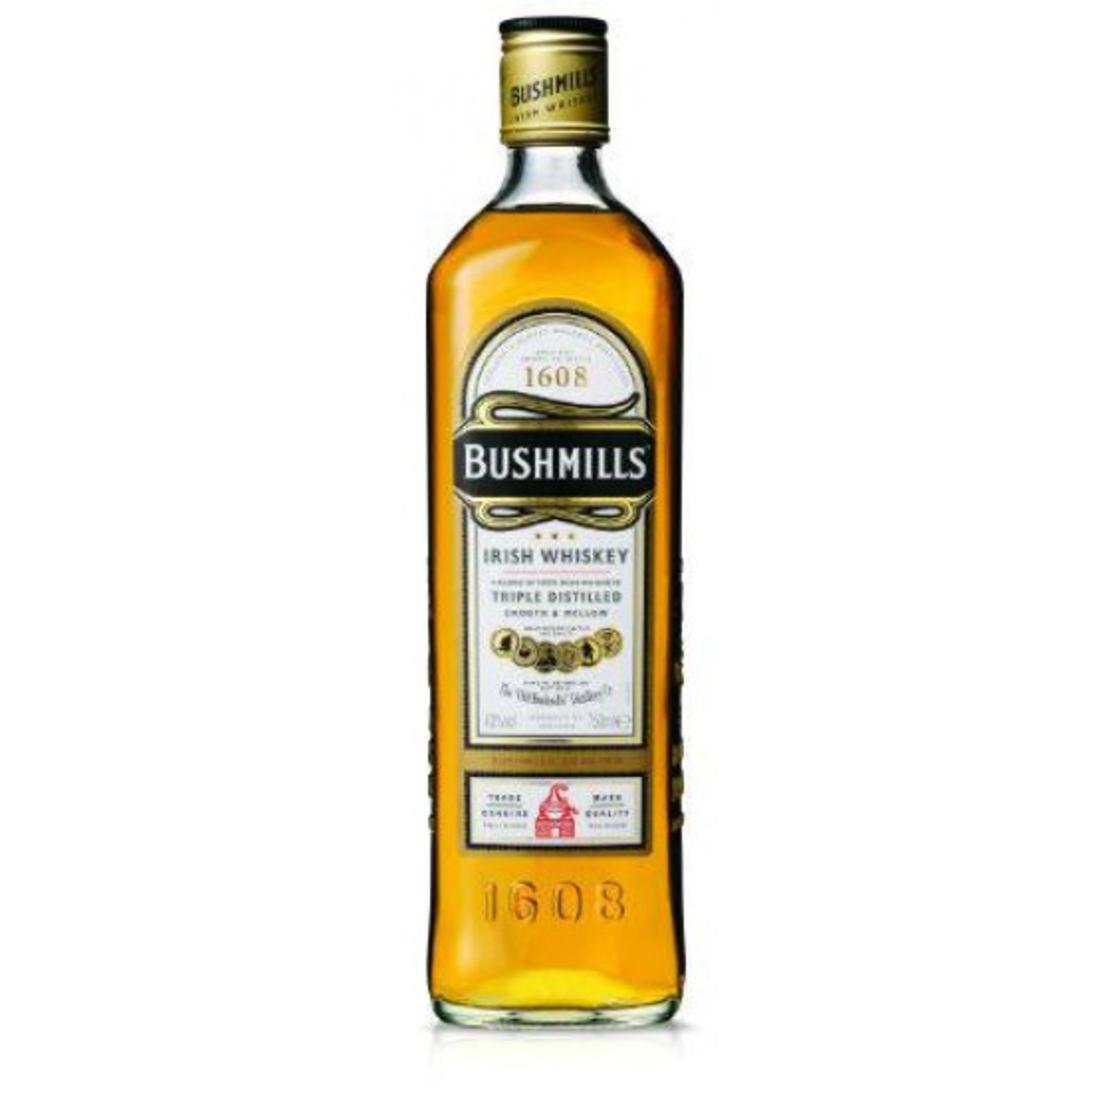 בושמיילס 1 ליטר